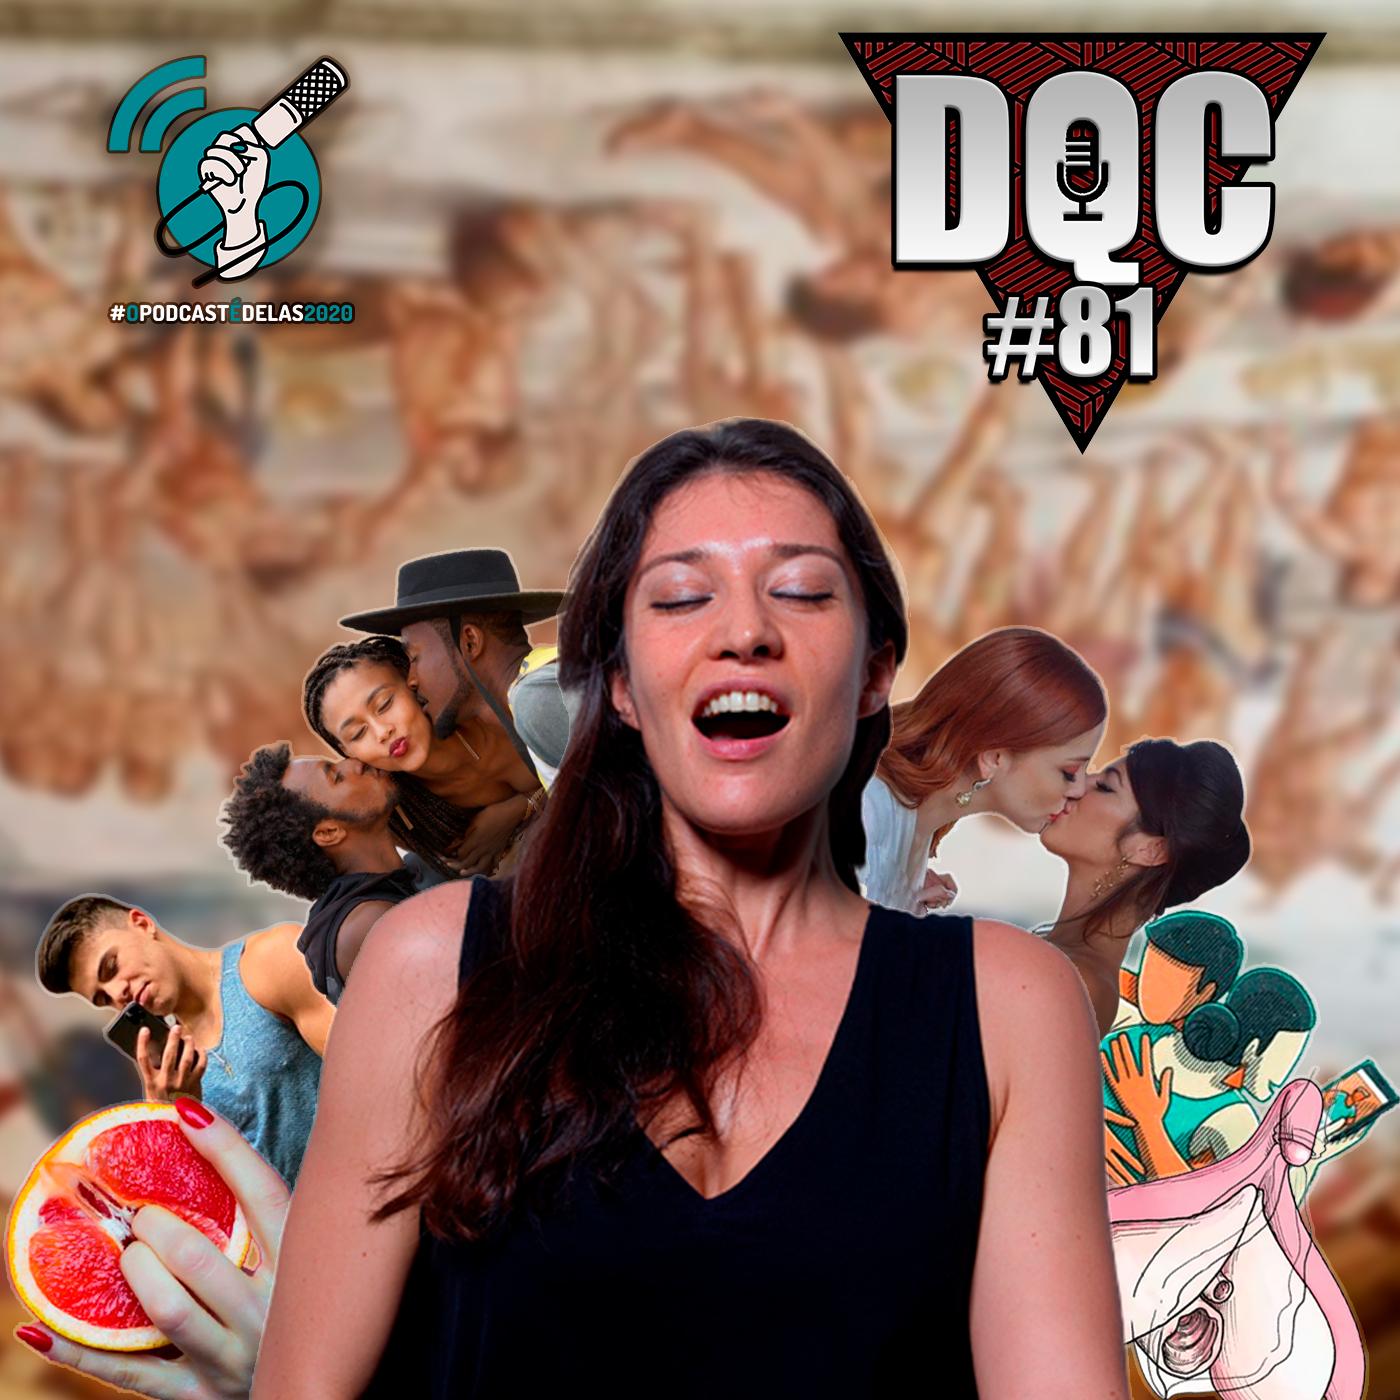 DQC #81 - O Sexo e Elas - Emerson Alves